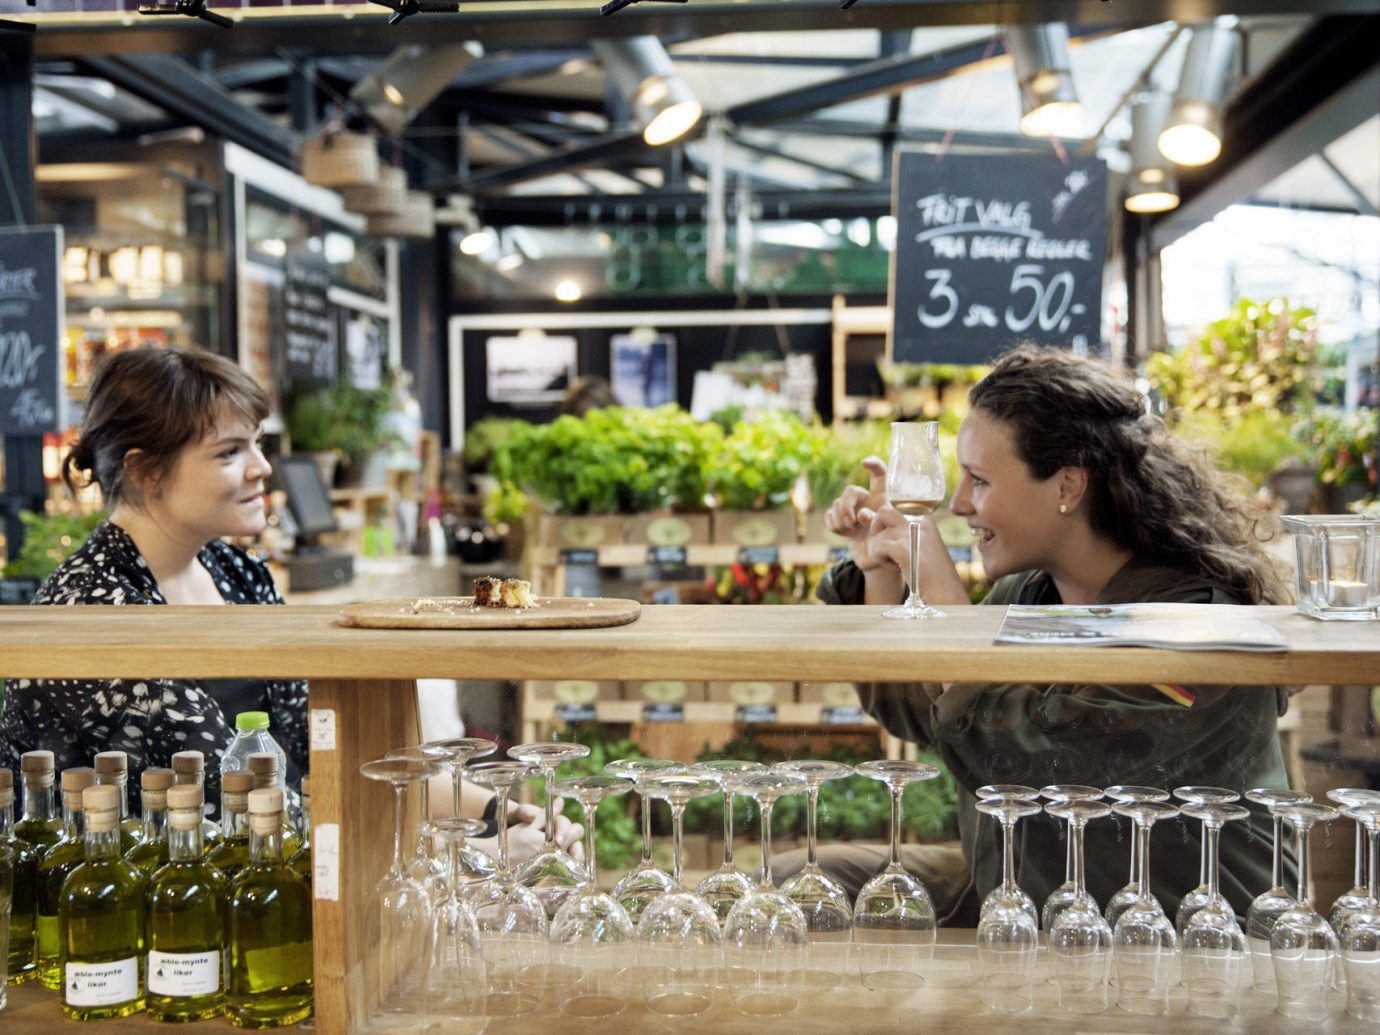 Food + Drink person floristry meal restaurant sense brunch retail Bar table